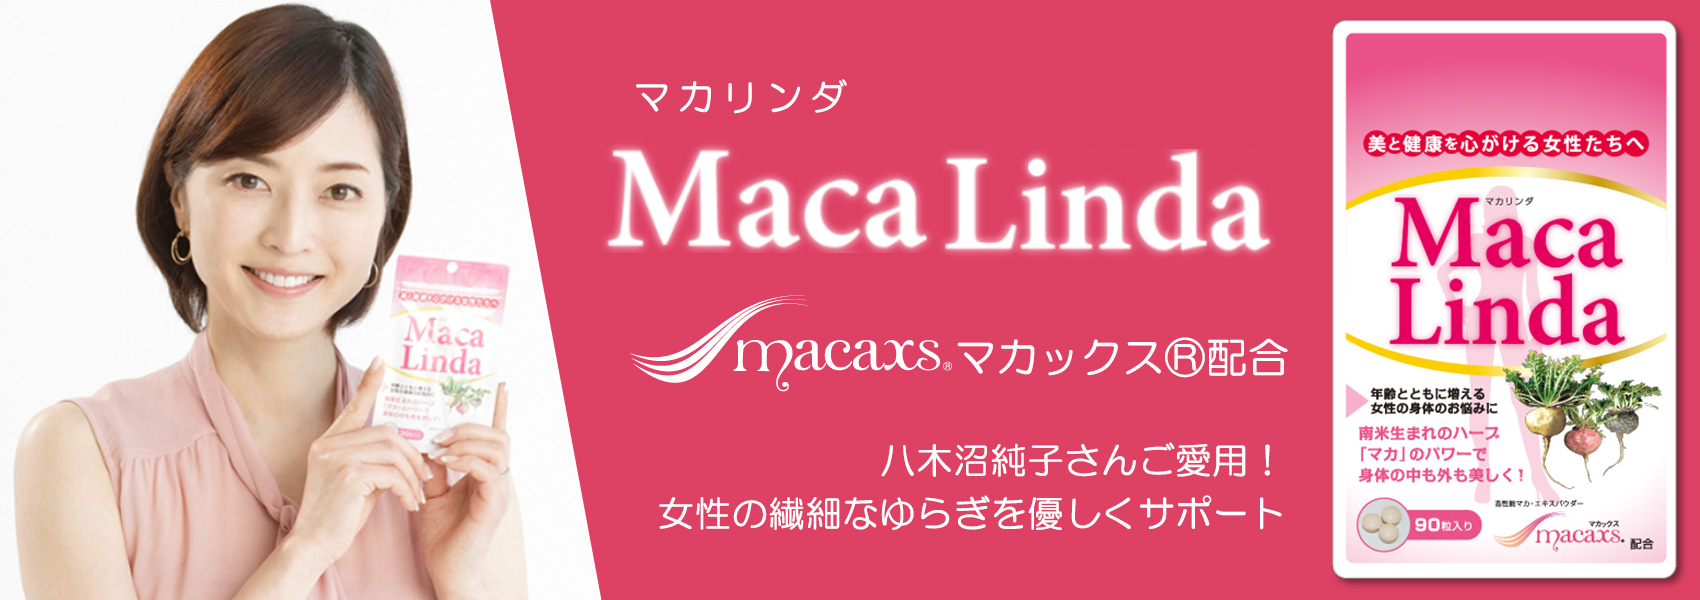 「MacaLinda(マカリンダ)」はフィギュアスケート解説でもおなじみ八木沼純子さんご愛用!マカの力でホルモンバランスの乱れや年齢の変化による女性の繊細な揺らぎを優しくサポートします!